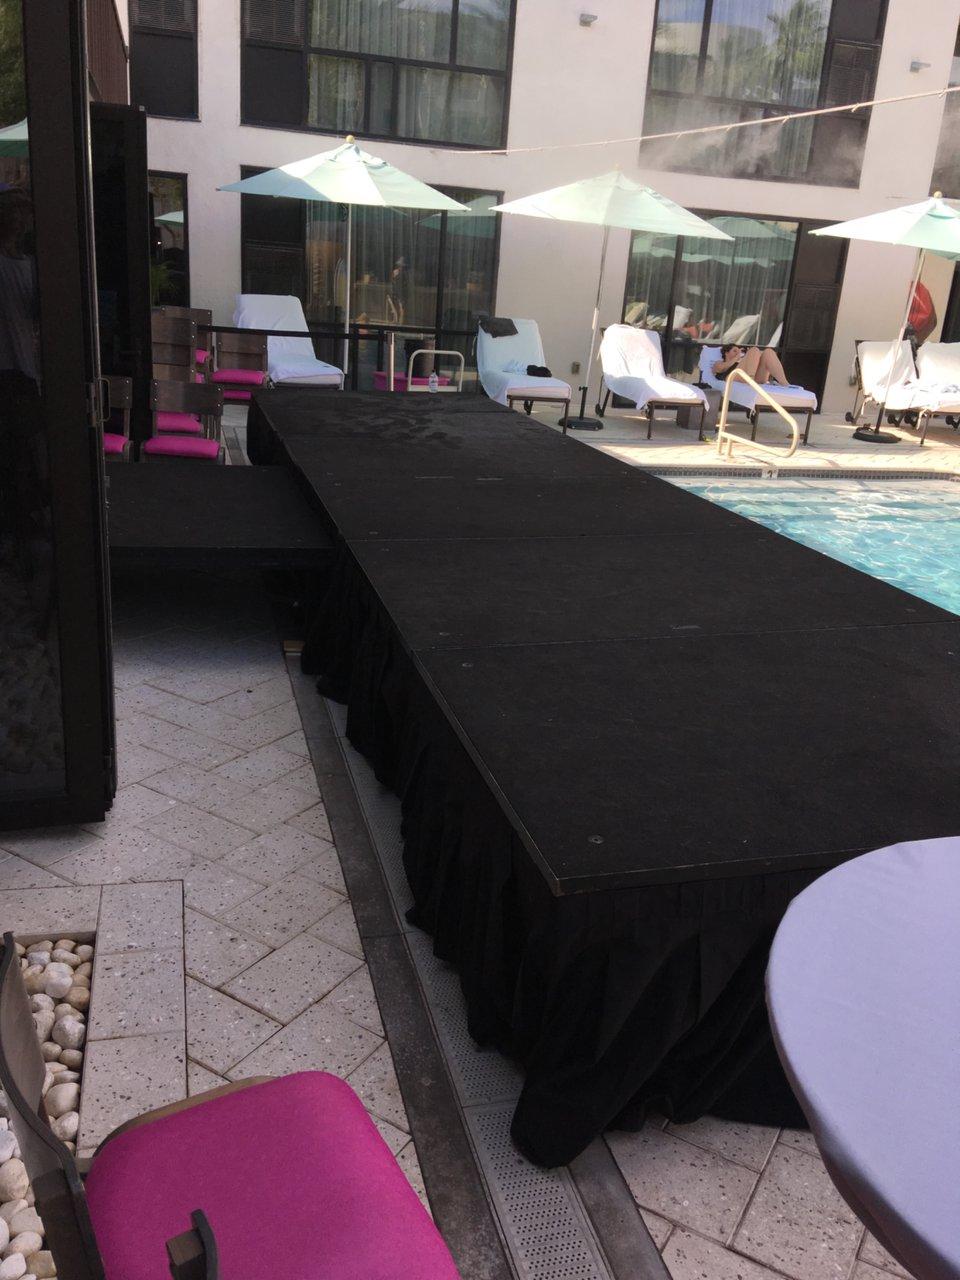 Fashion show @ Found RE Phoenix Hotel photo 93E5B70B-2C39-4739-AFFA-8CC410C880F5.jpg